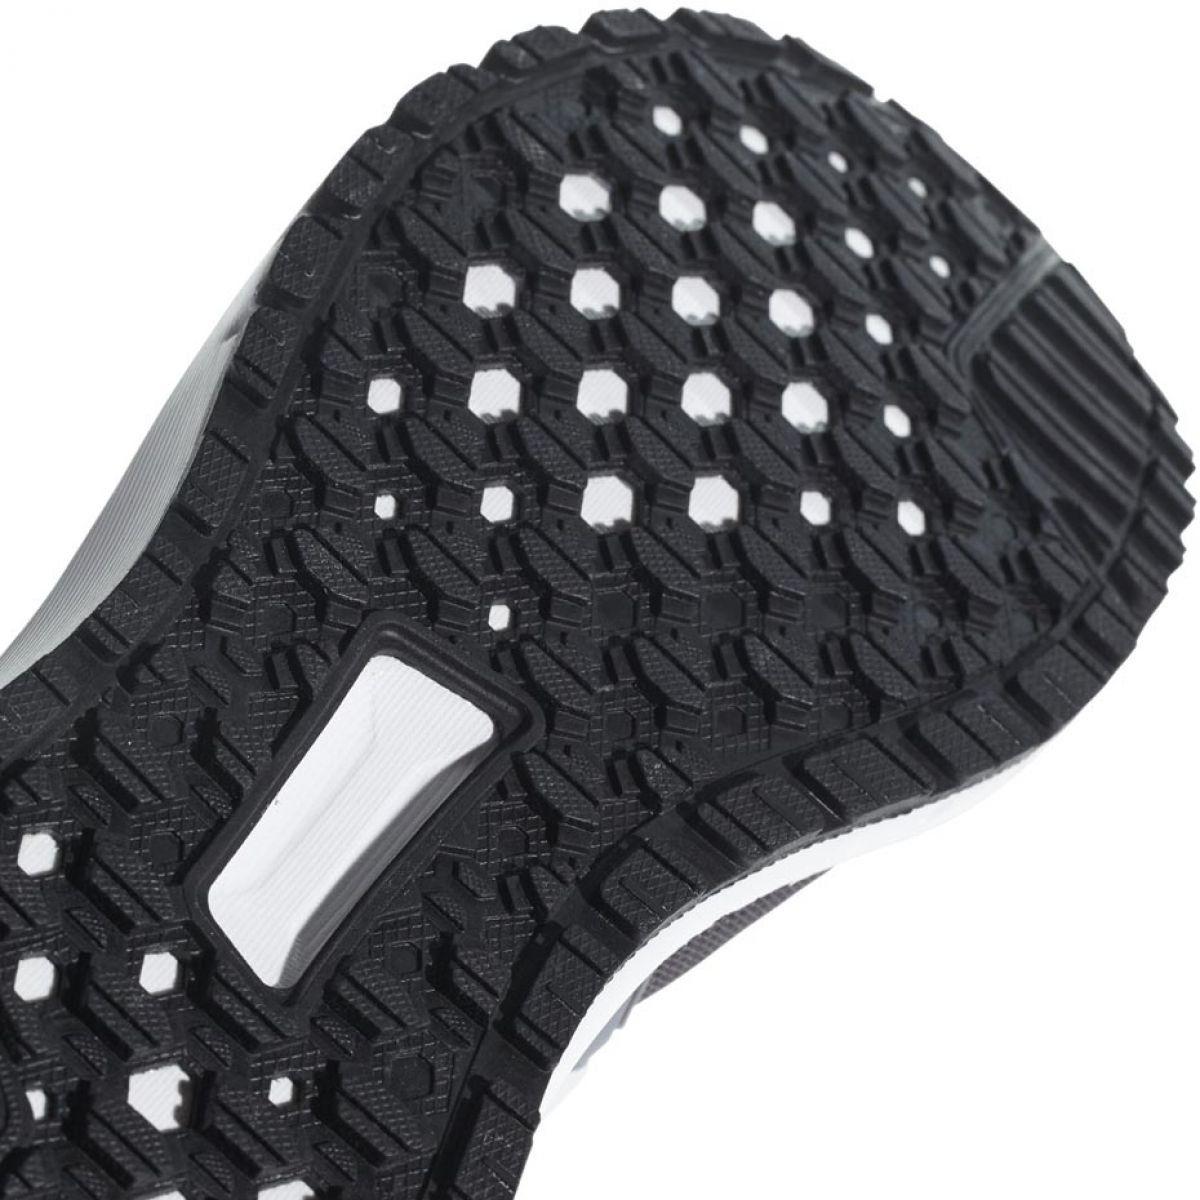 Buty Biegowe Adidas Energy Cloud 2 M B44751 Szare Running Shoes Adidas Running Shoes Grey Adidas